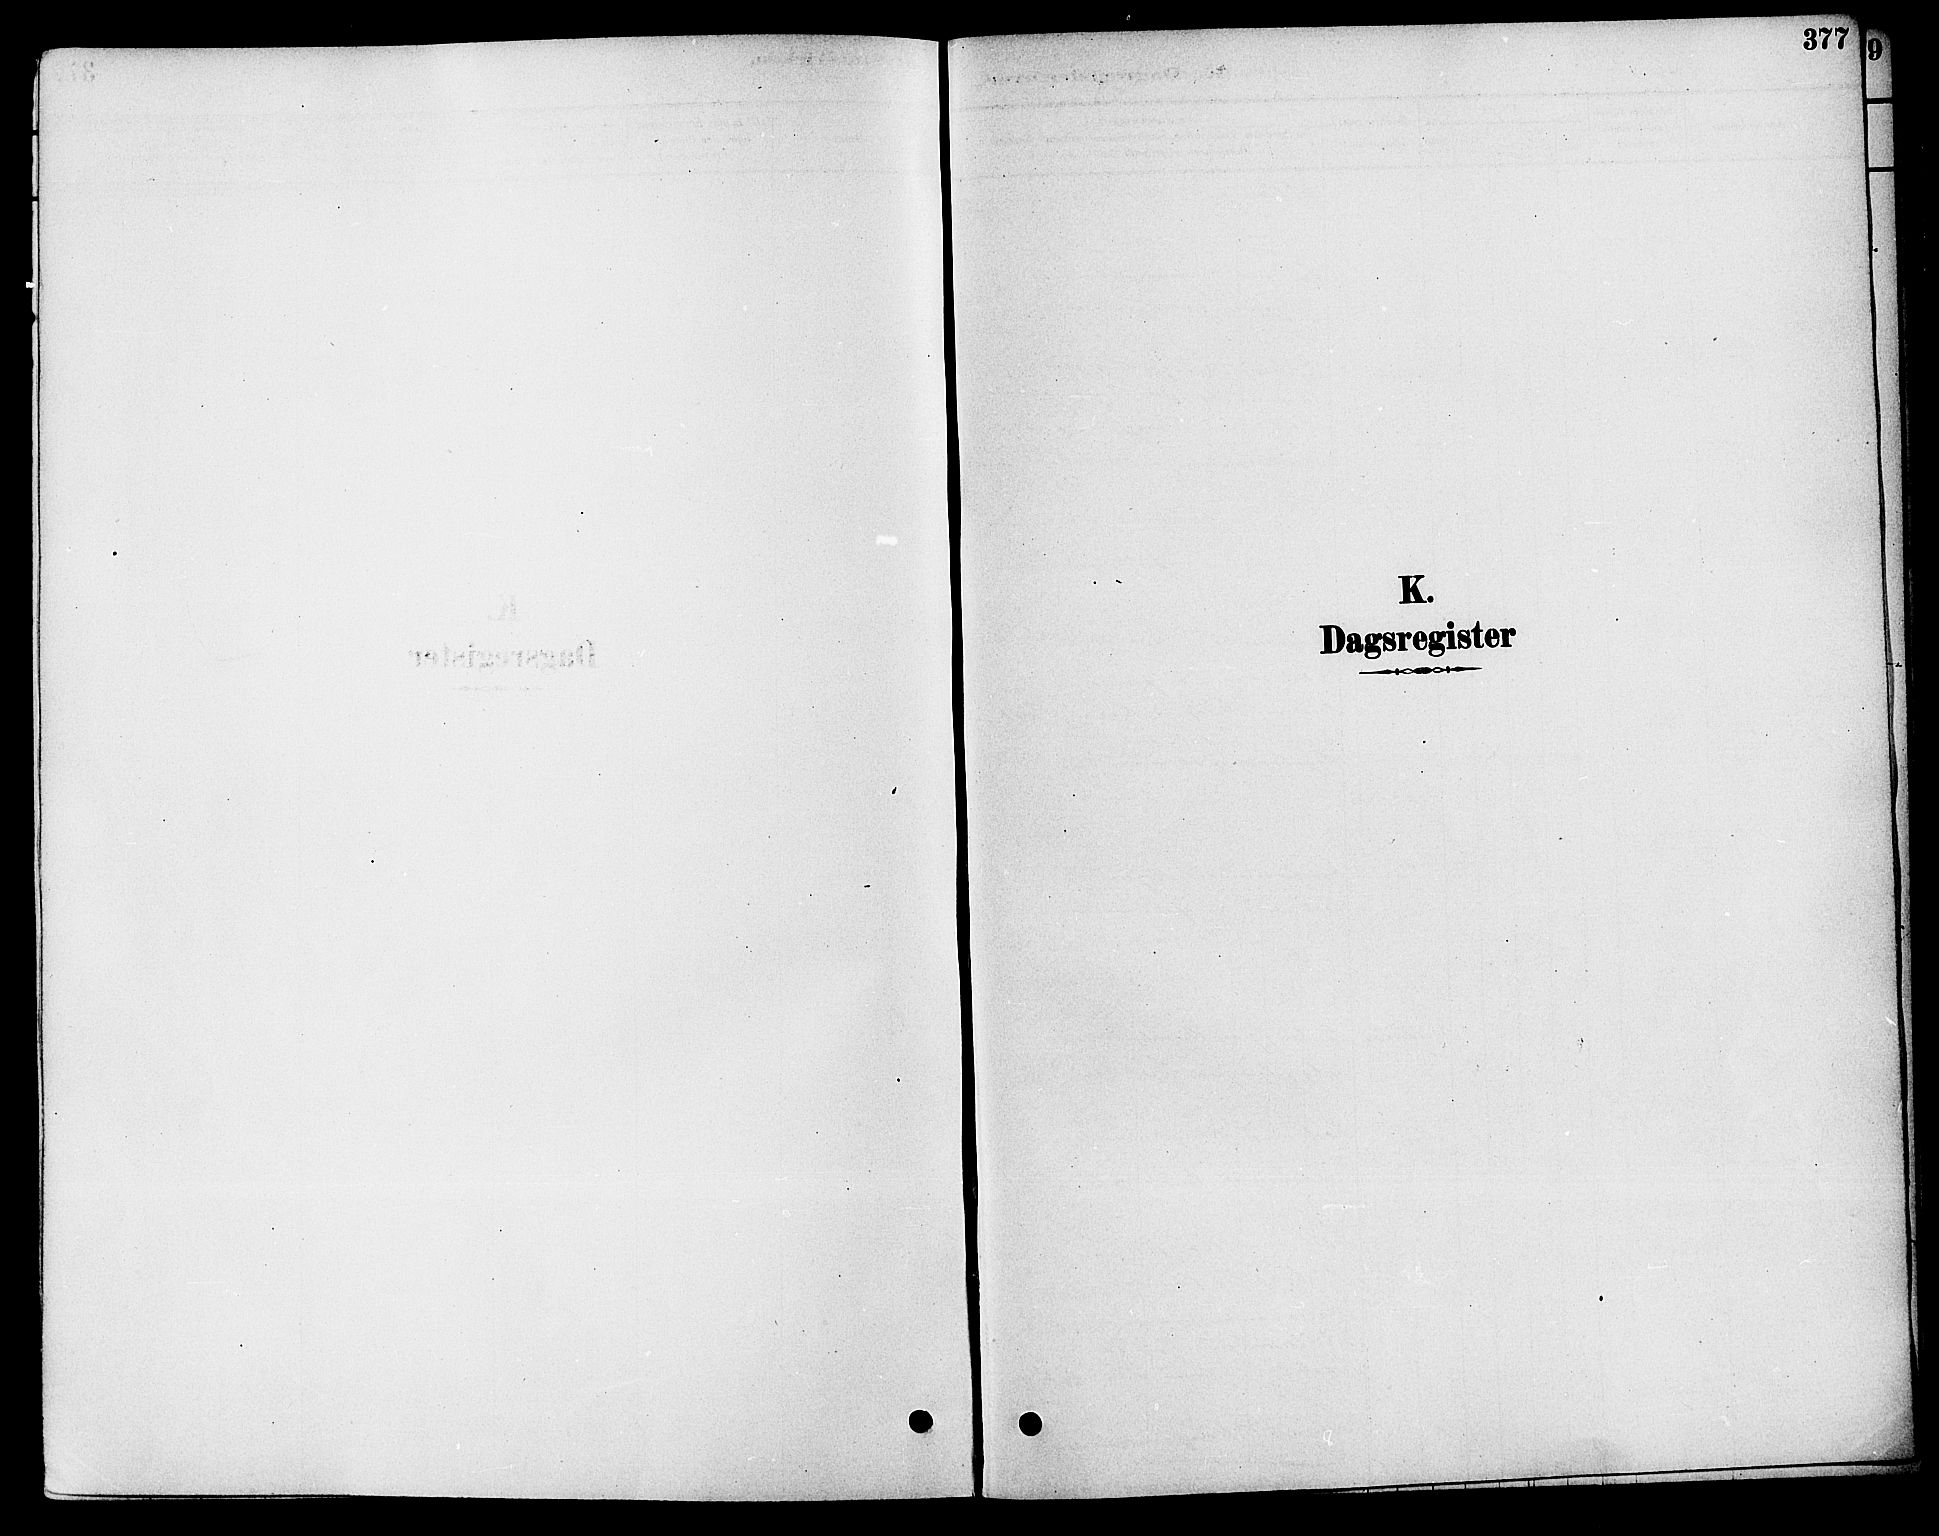 SAKO, Solum kirkebøker, F/Fa/L0009: Ministerialbok nr. I 9, 1877-1887, s. 377